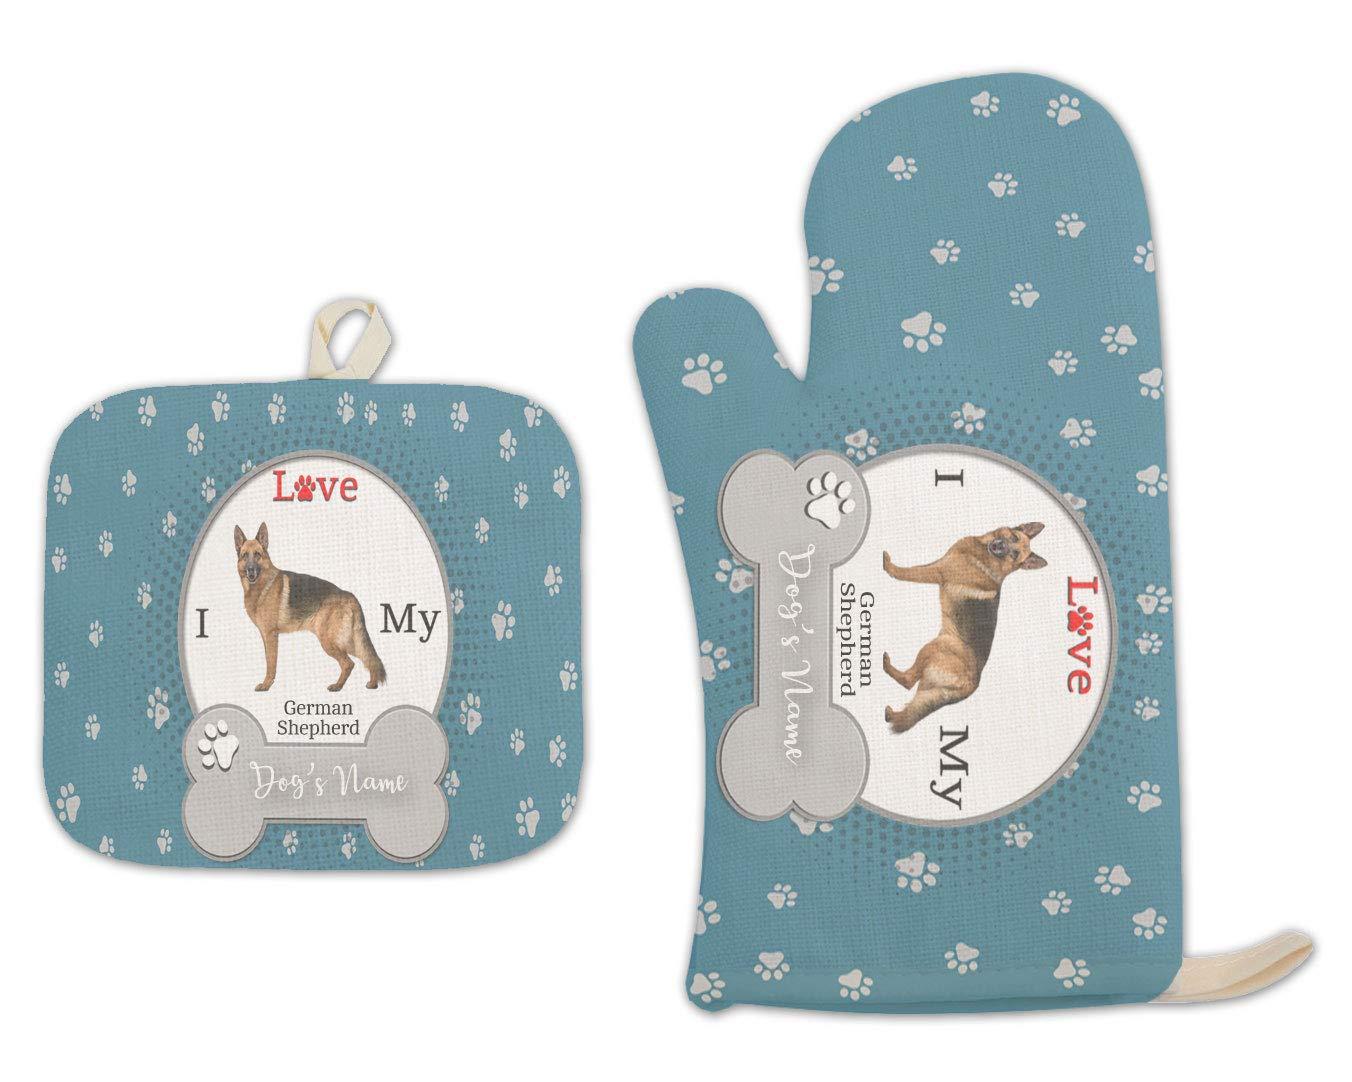 Bleu Reign BRGiftShop Personalized Custom Name I Love My Dog German Shepherd Linen Oven Mitt and Potholder Set